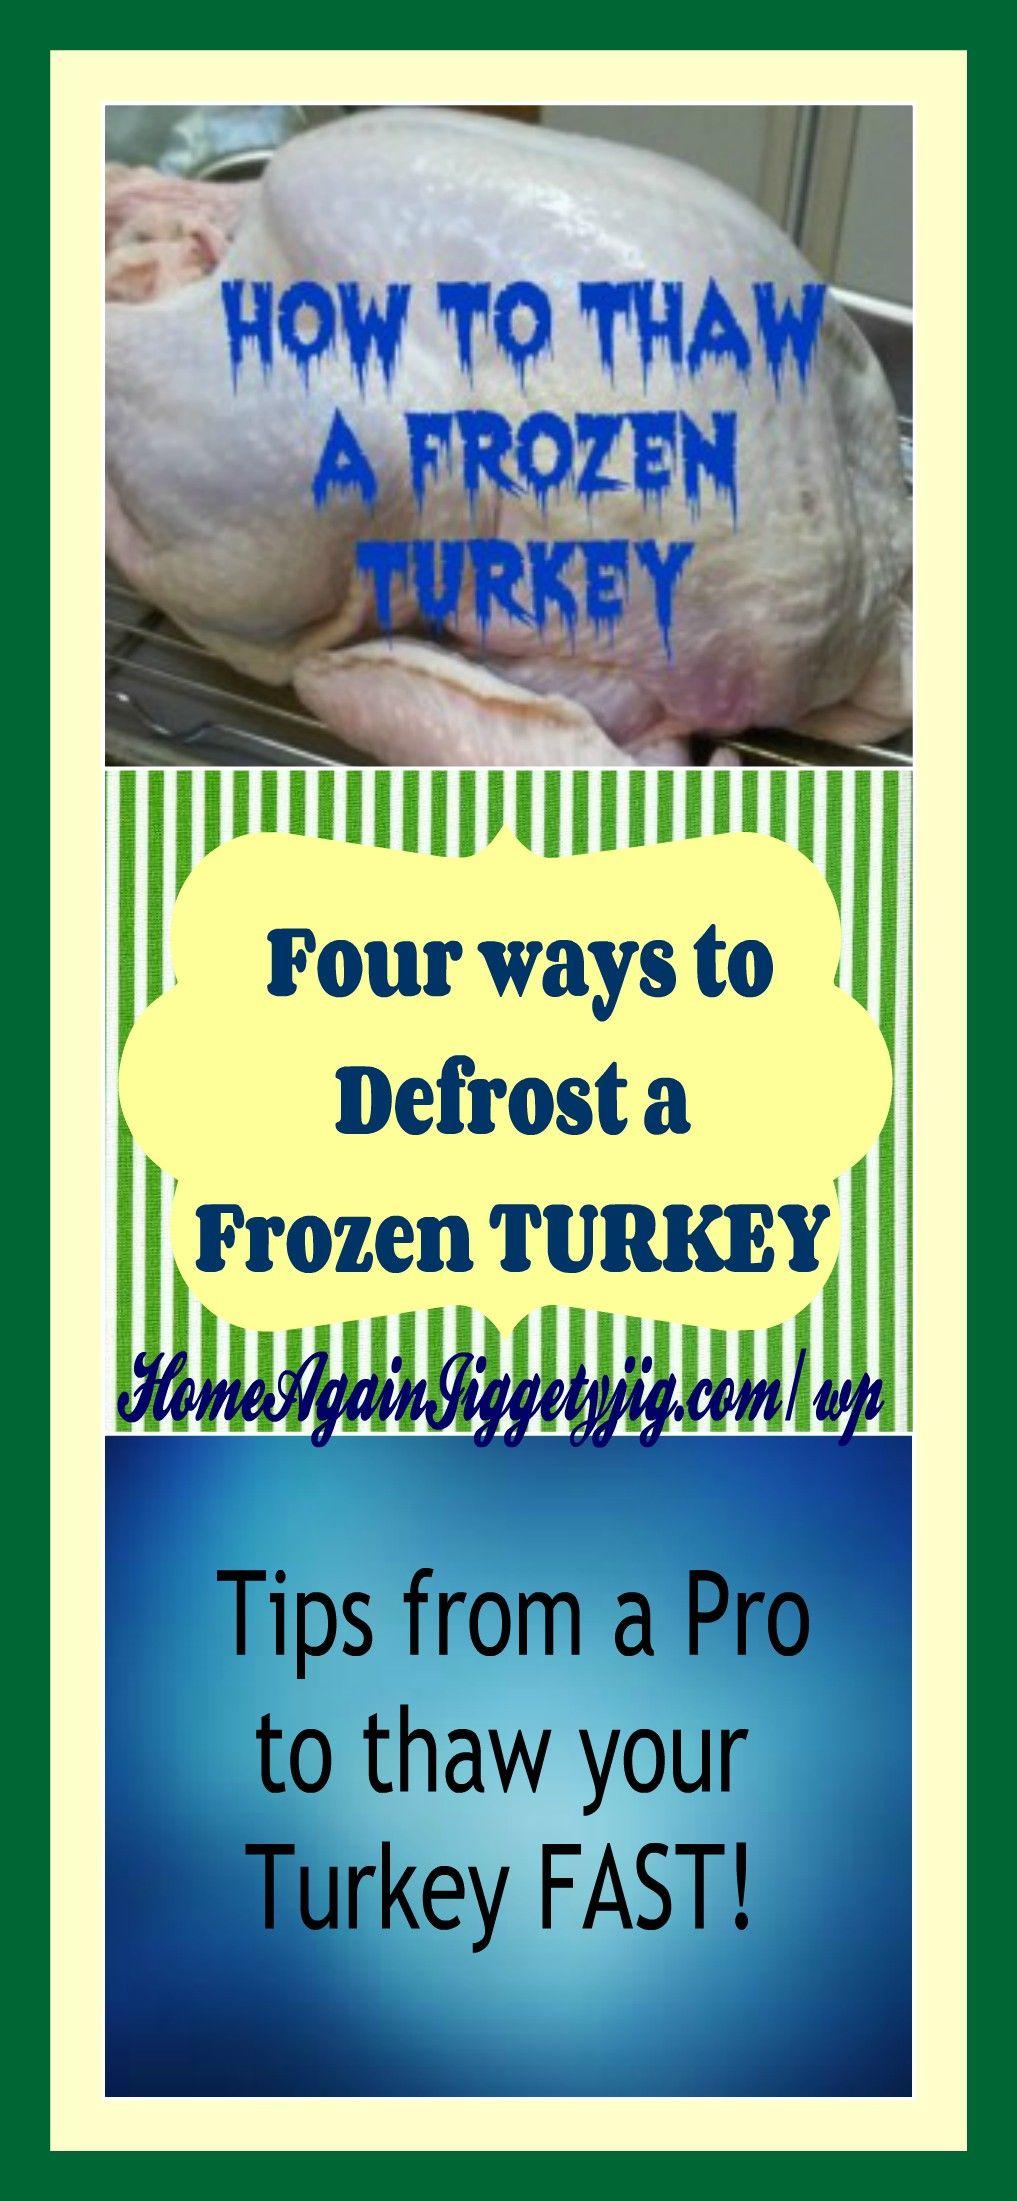 How To Defrost A Frozen Turkey Home Again Jiggety Jig Frozen Turkey Thawing Turkey Cooking A Frozen Turkey,Tempura Batter Recipe Vegan